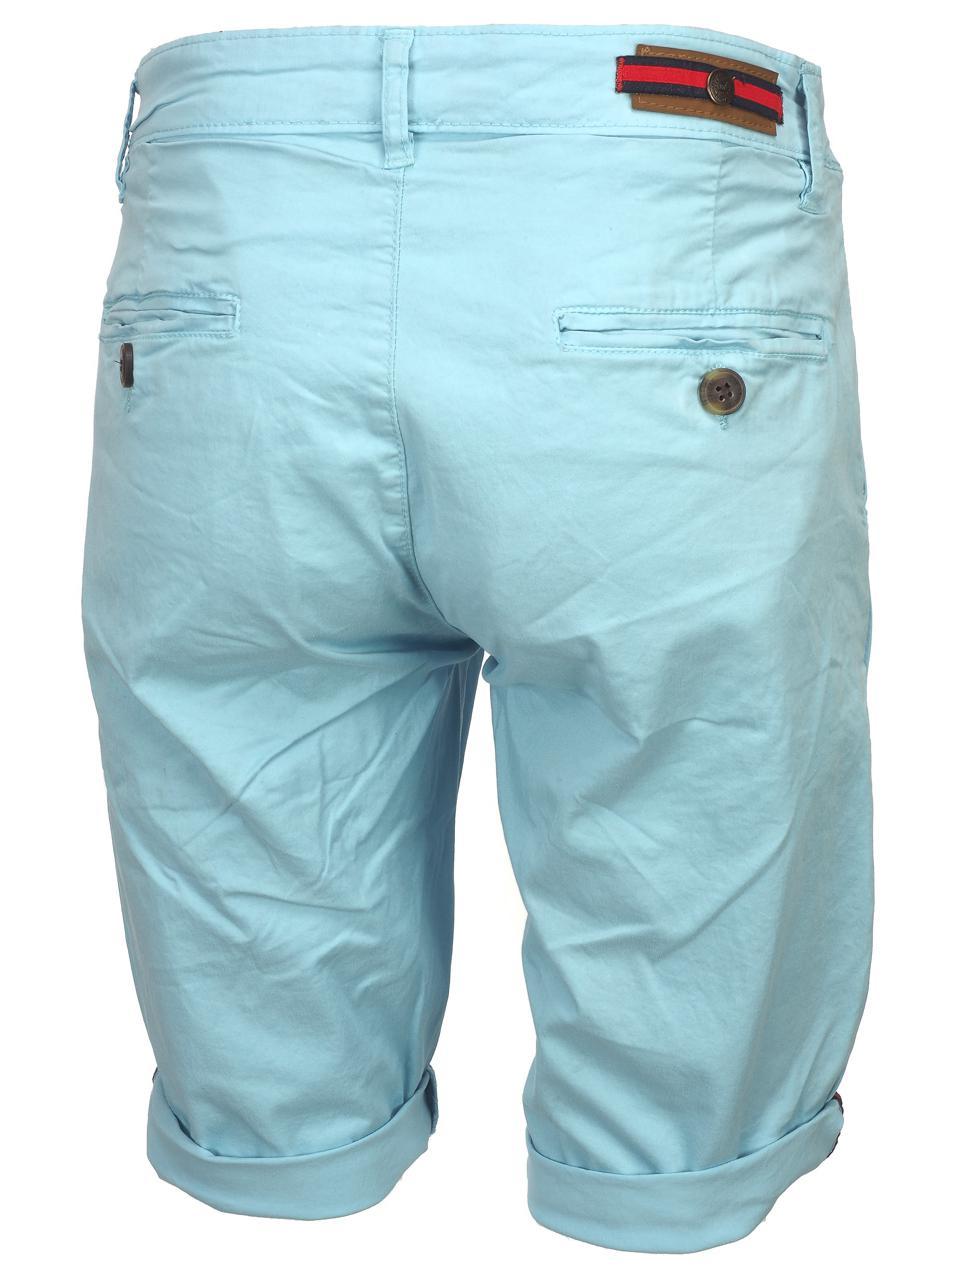 Bermuda-Shorts-Hite-Couture-Vobier-Sky-Bermuda-Chino-Blue-11597-New thumbnail 5